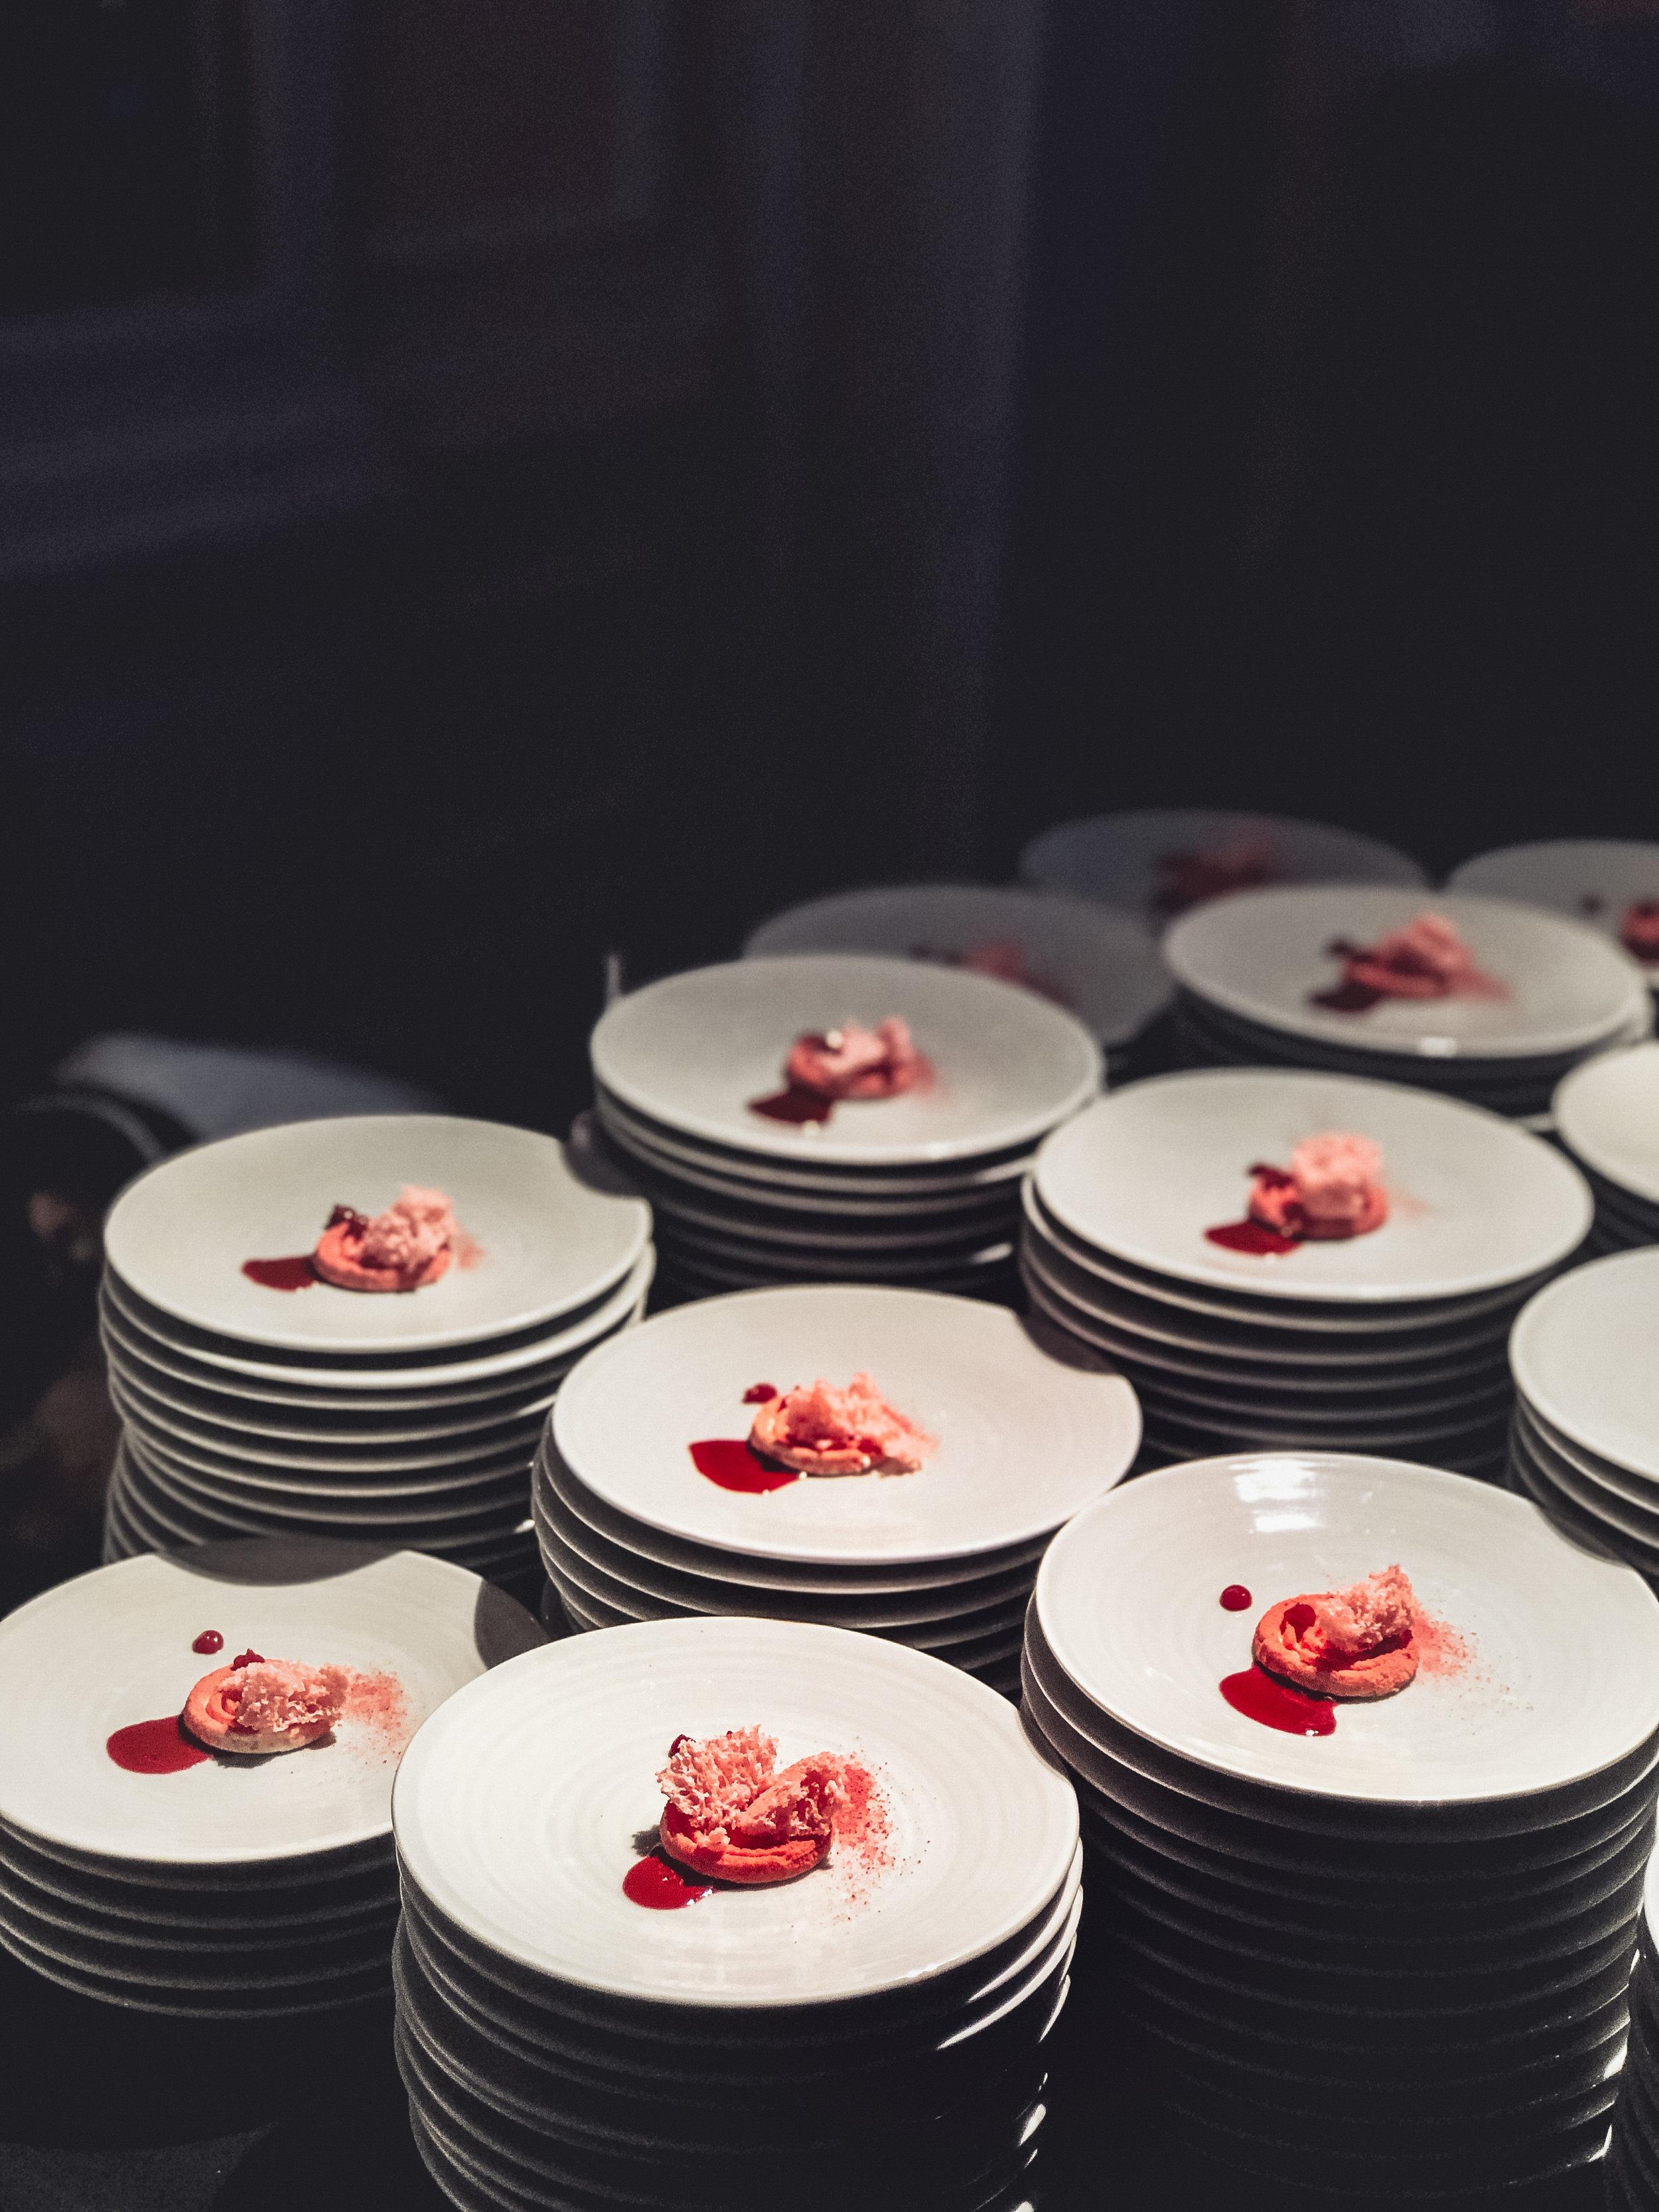 "Dessert ""La Vie en Rose"" with sorbet, currants, blackberries and lavender by Fabrizio Piantanida"